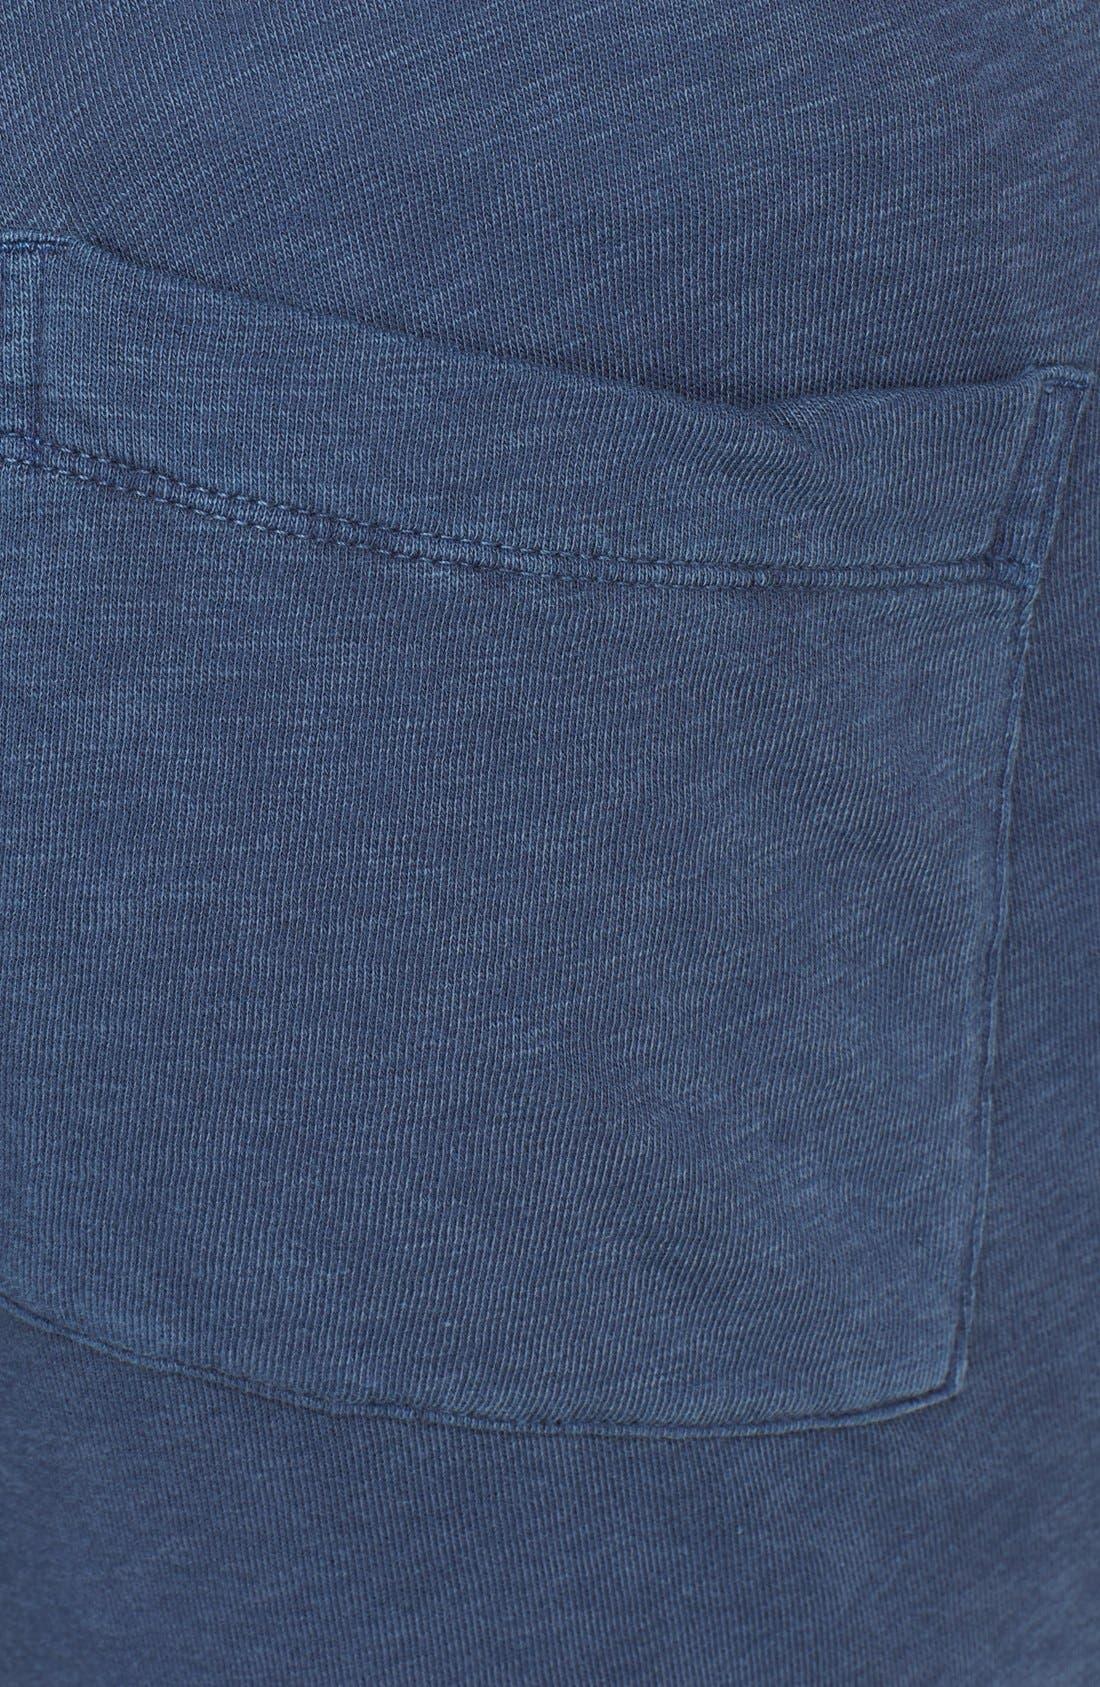 'Classic' Sweatpants,                             Alternate thumbnail 28, color,